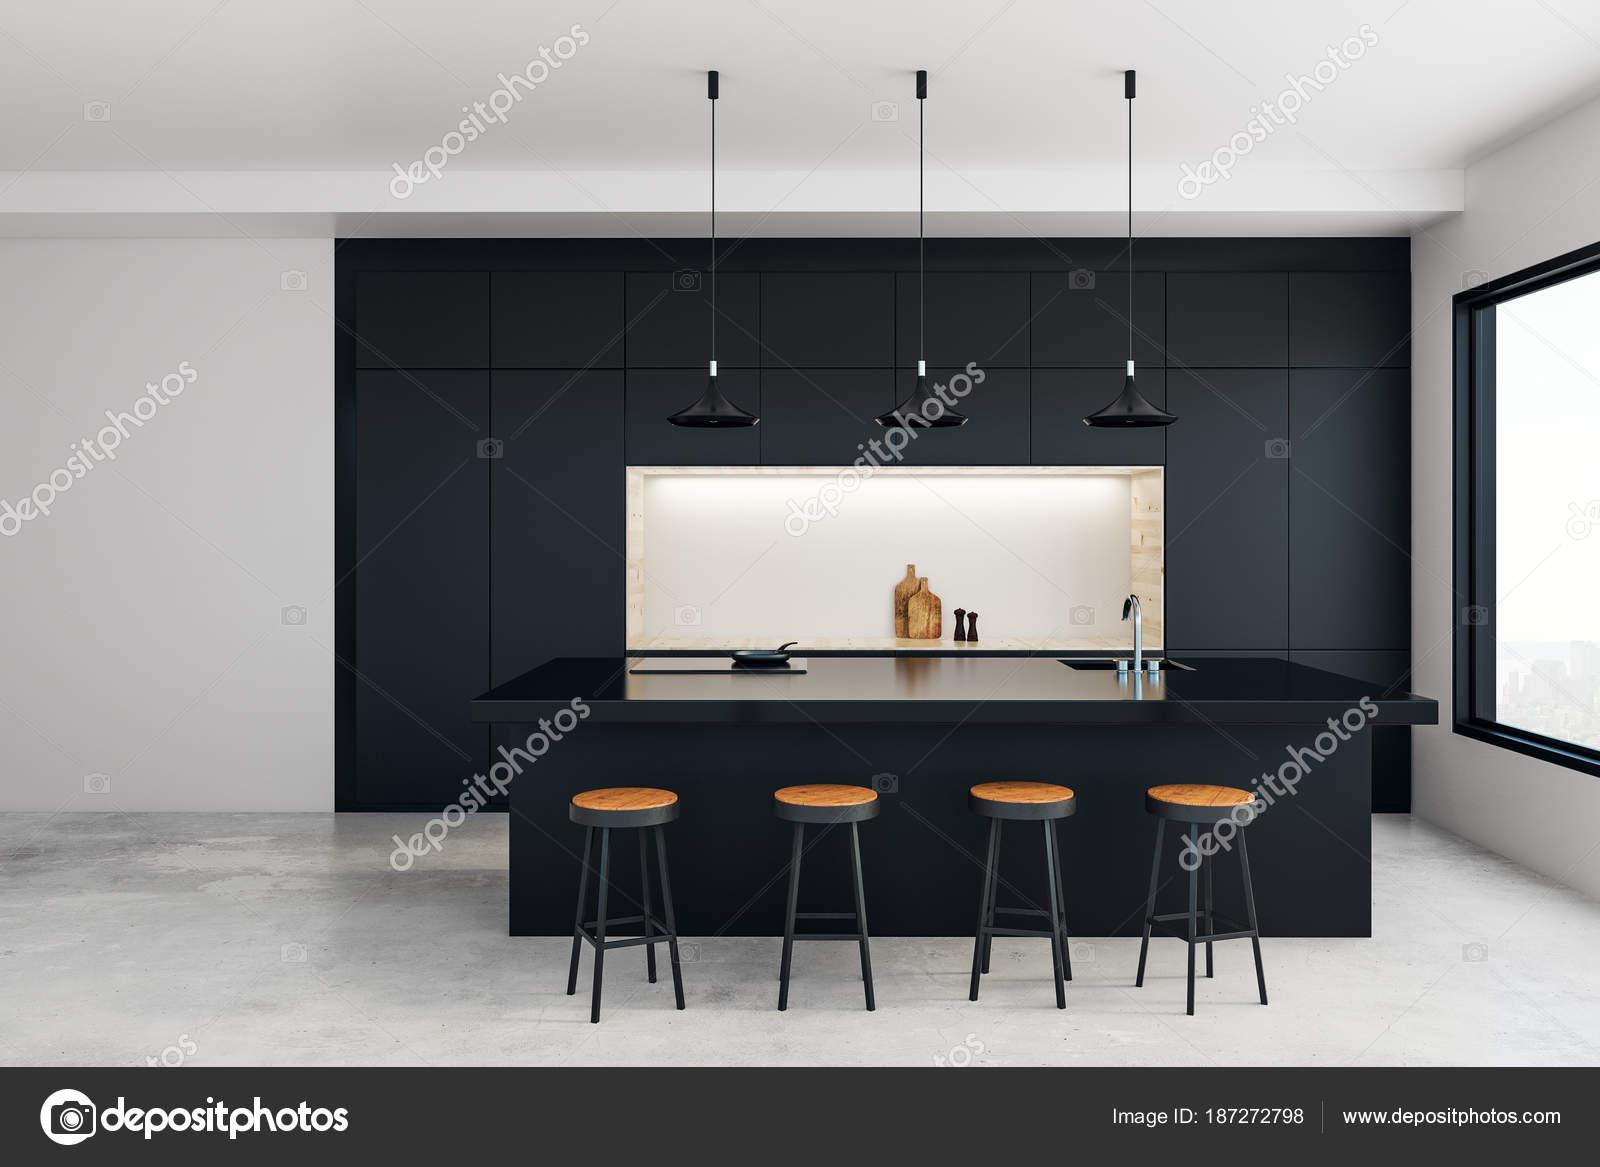 Studio moderna cucina u2014 foto stock © peshkova #187272798